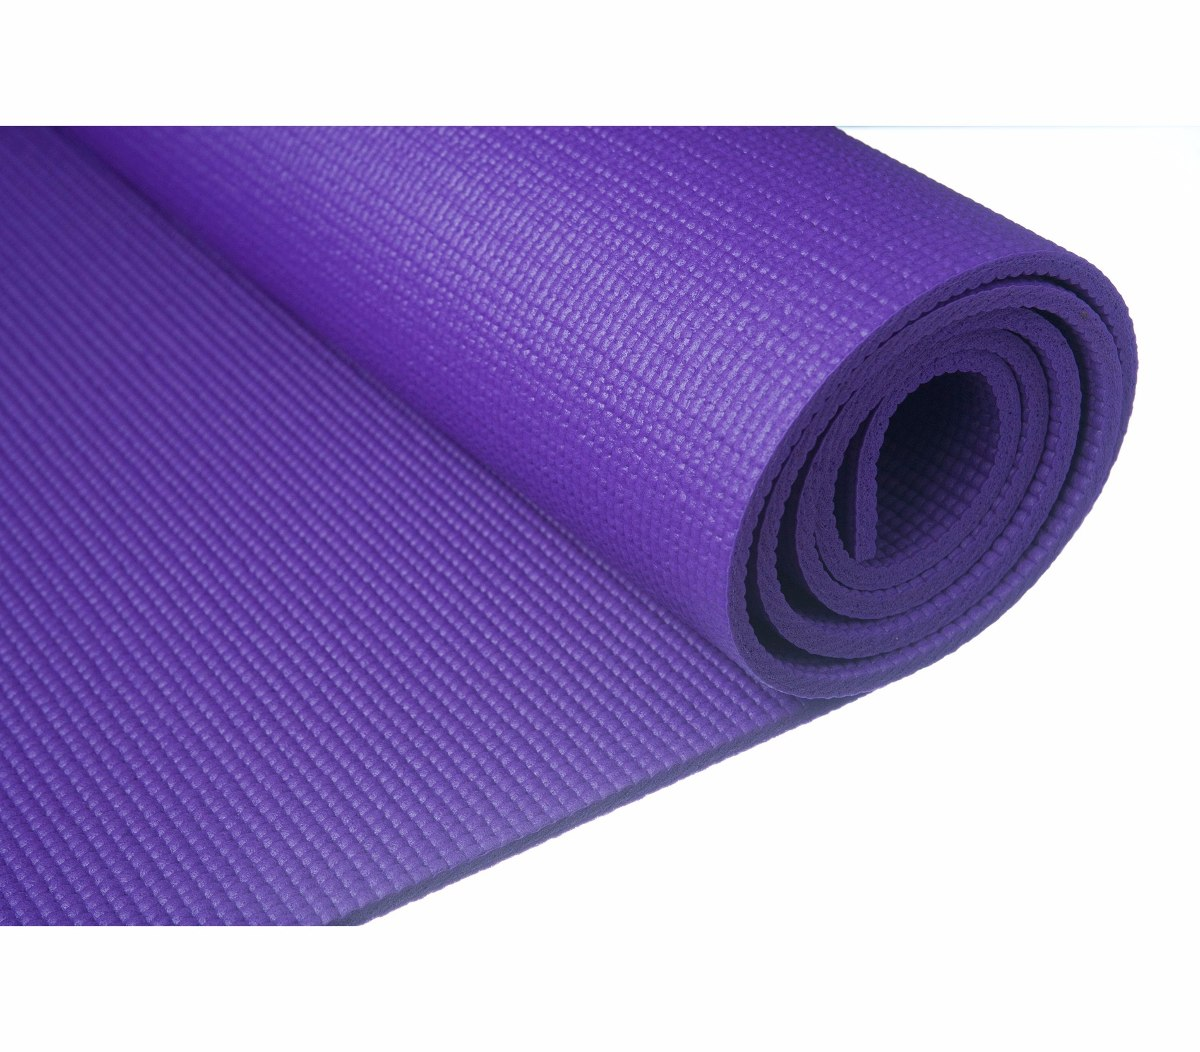 Tapete De Yoga, Yoga Mat 5mm!!